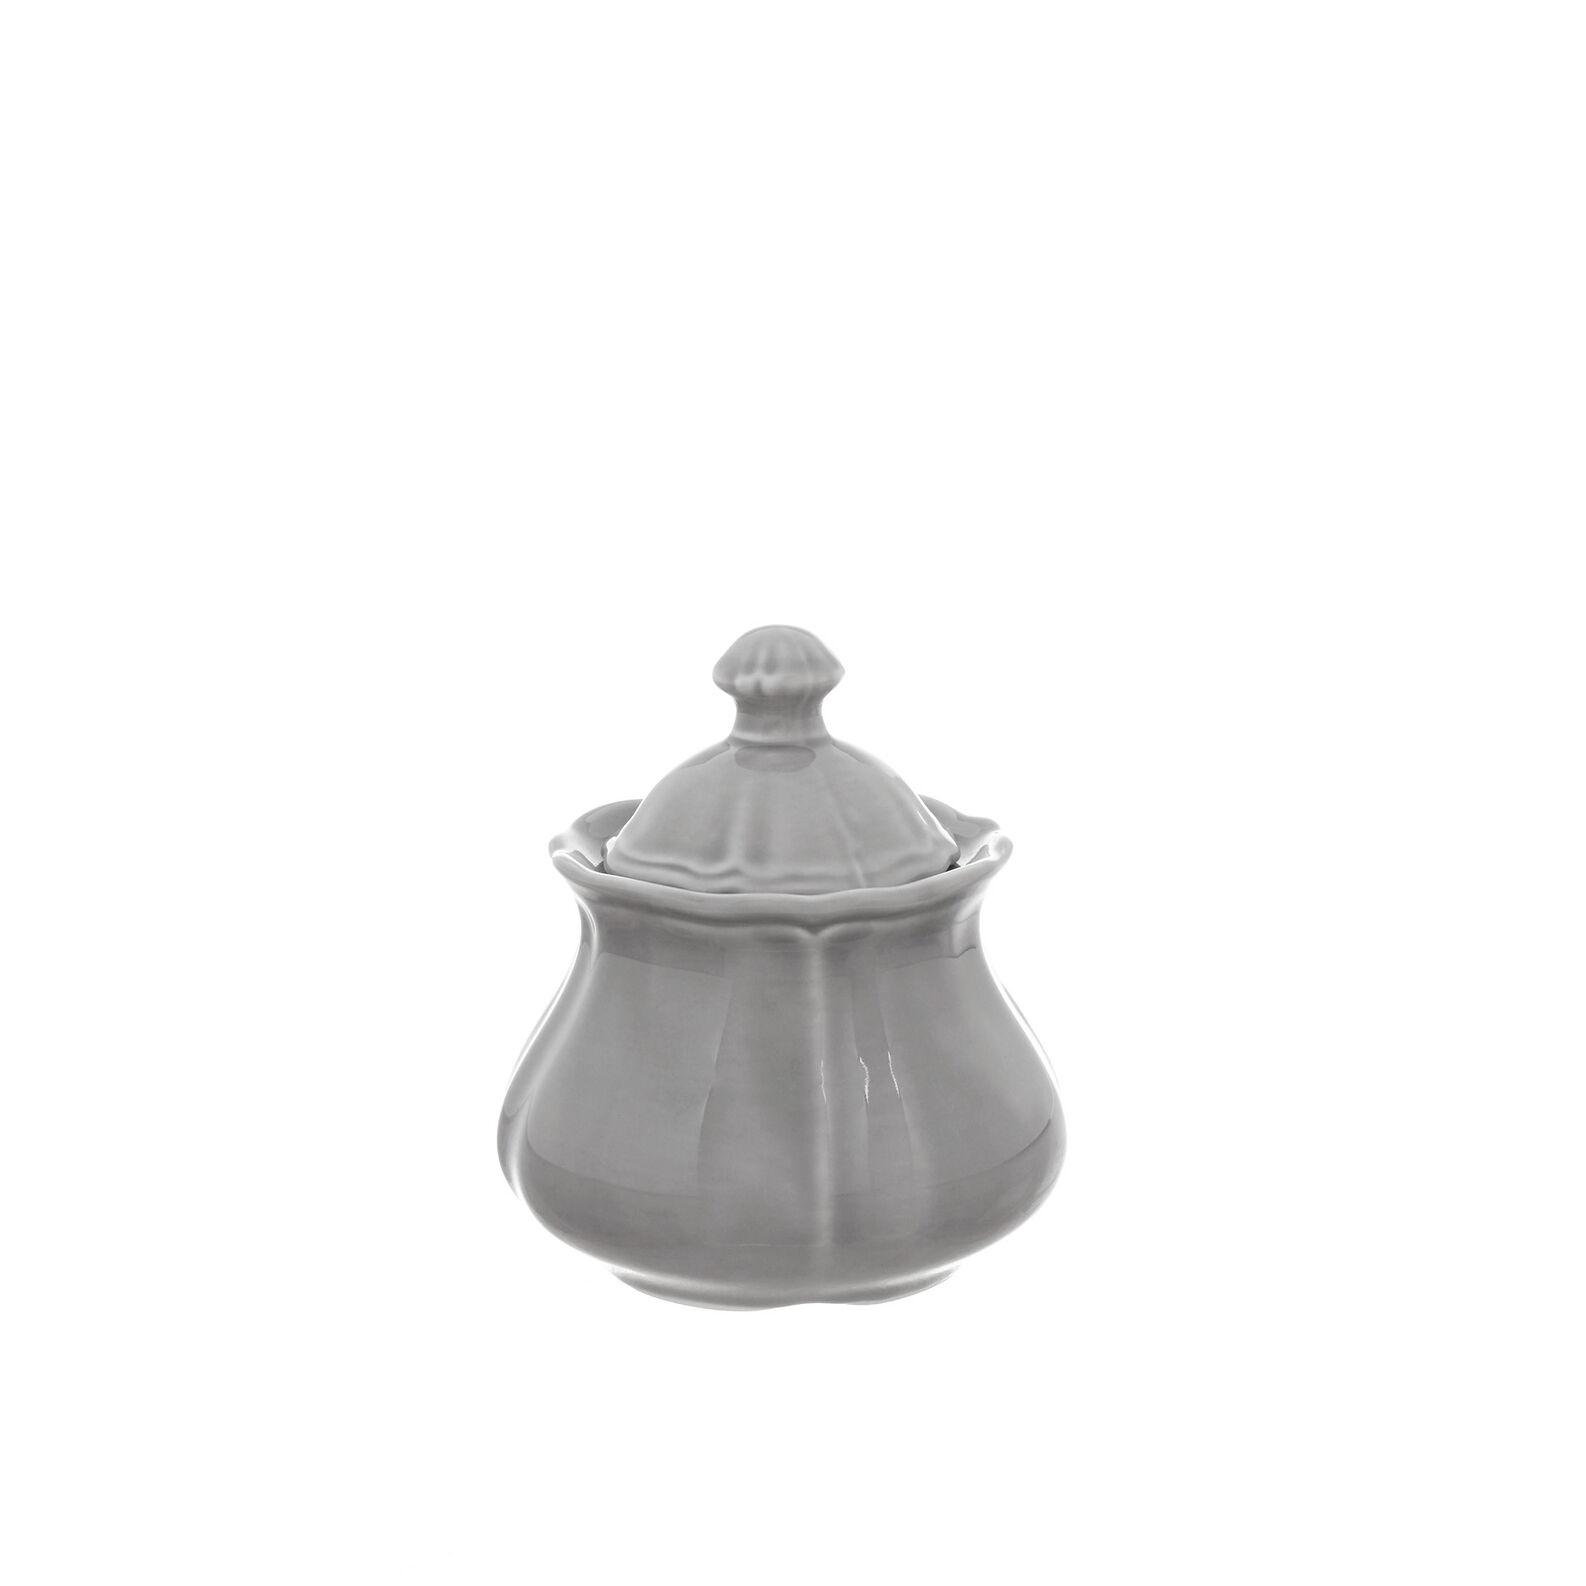 Romantic glazed china sugar bowl